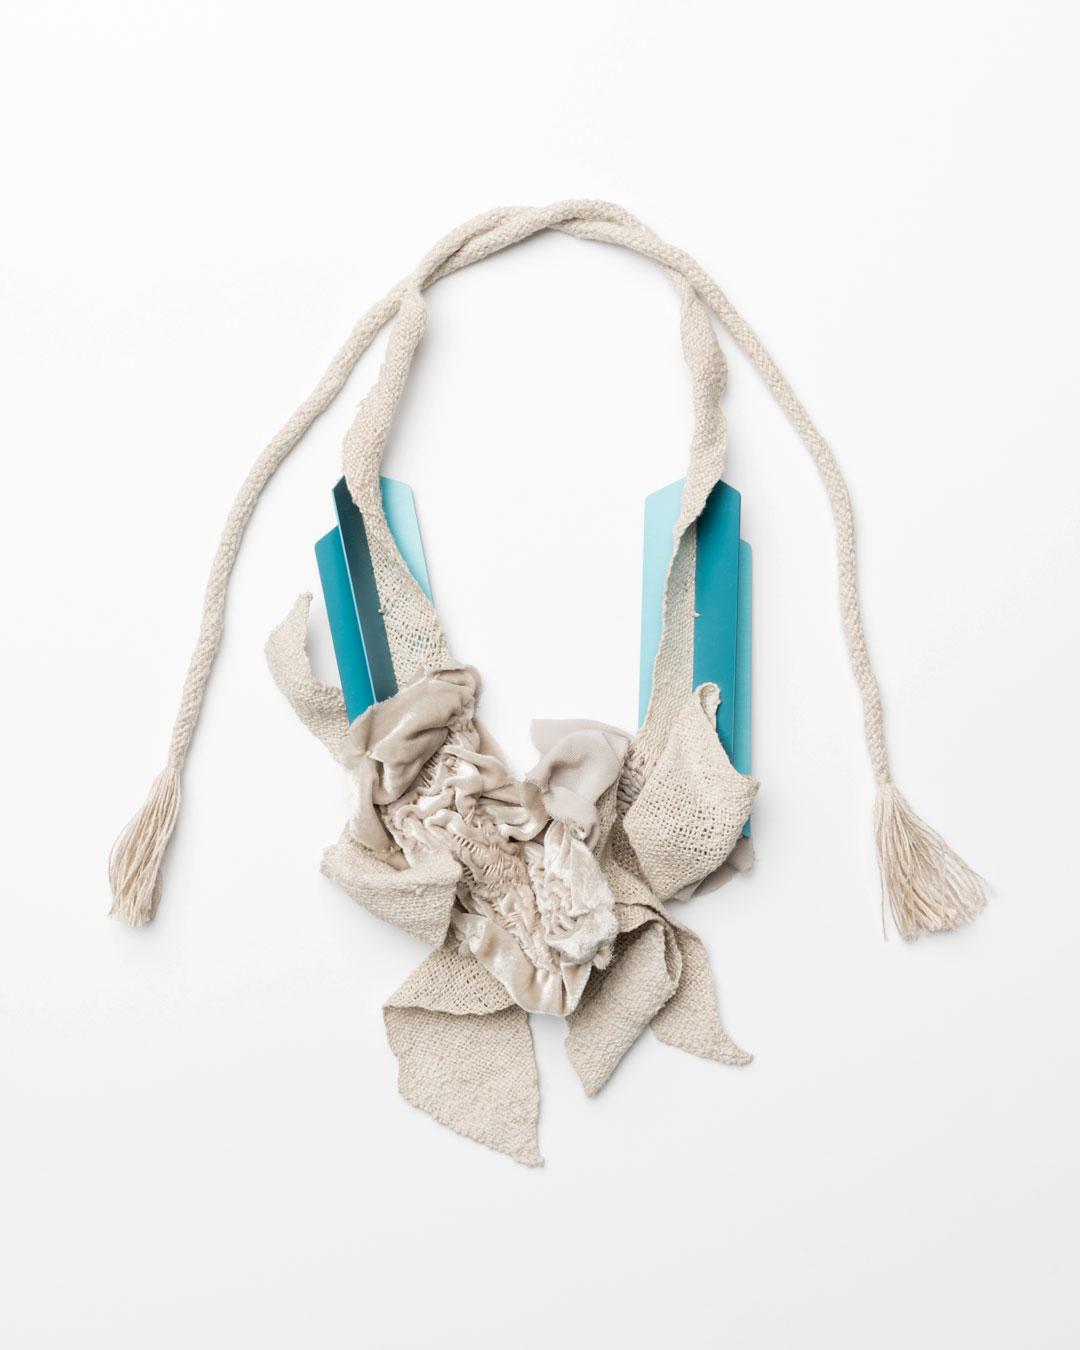 Ineke Heerkens, Many Sensations, 2017, necklace; linen, silk-velvet, anodised aluminium, 400 x 170 x 55 mm, €3200